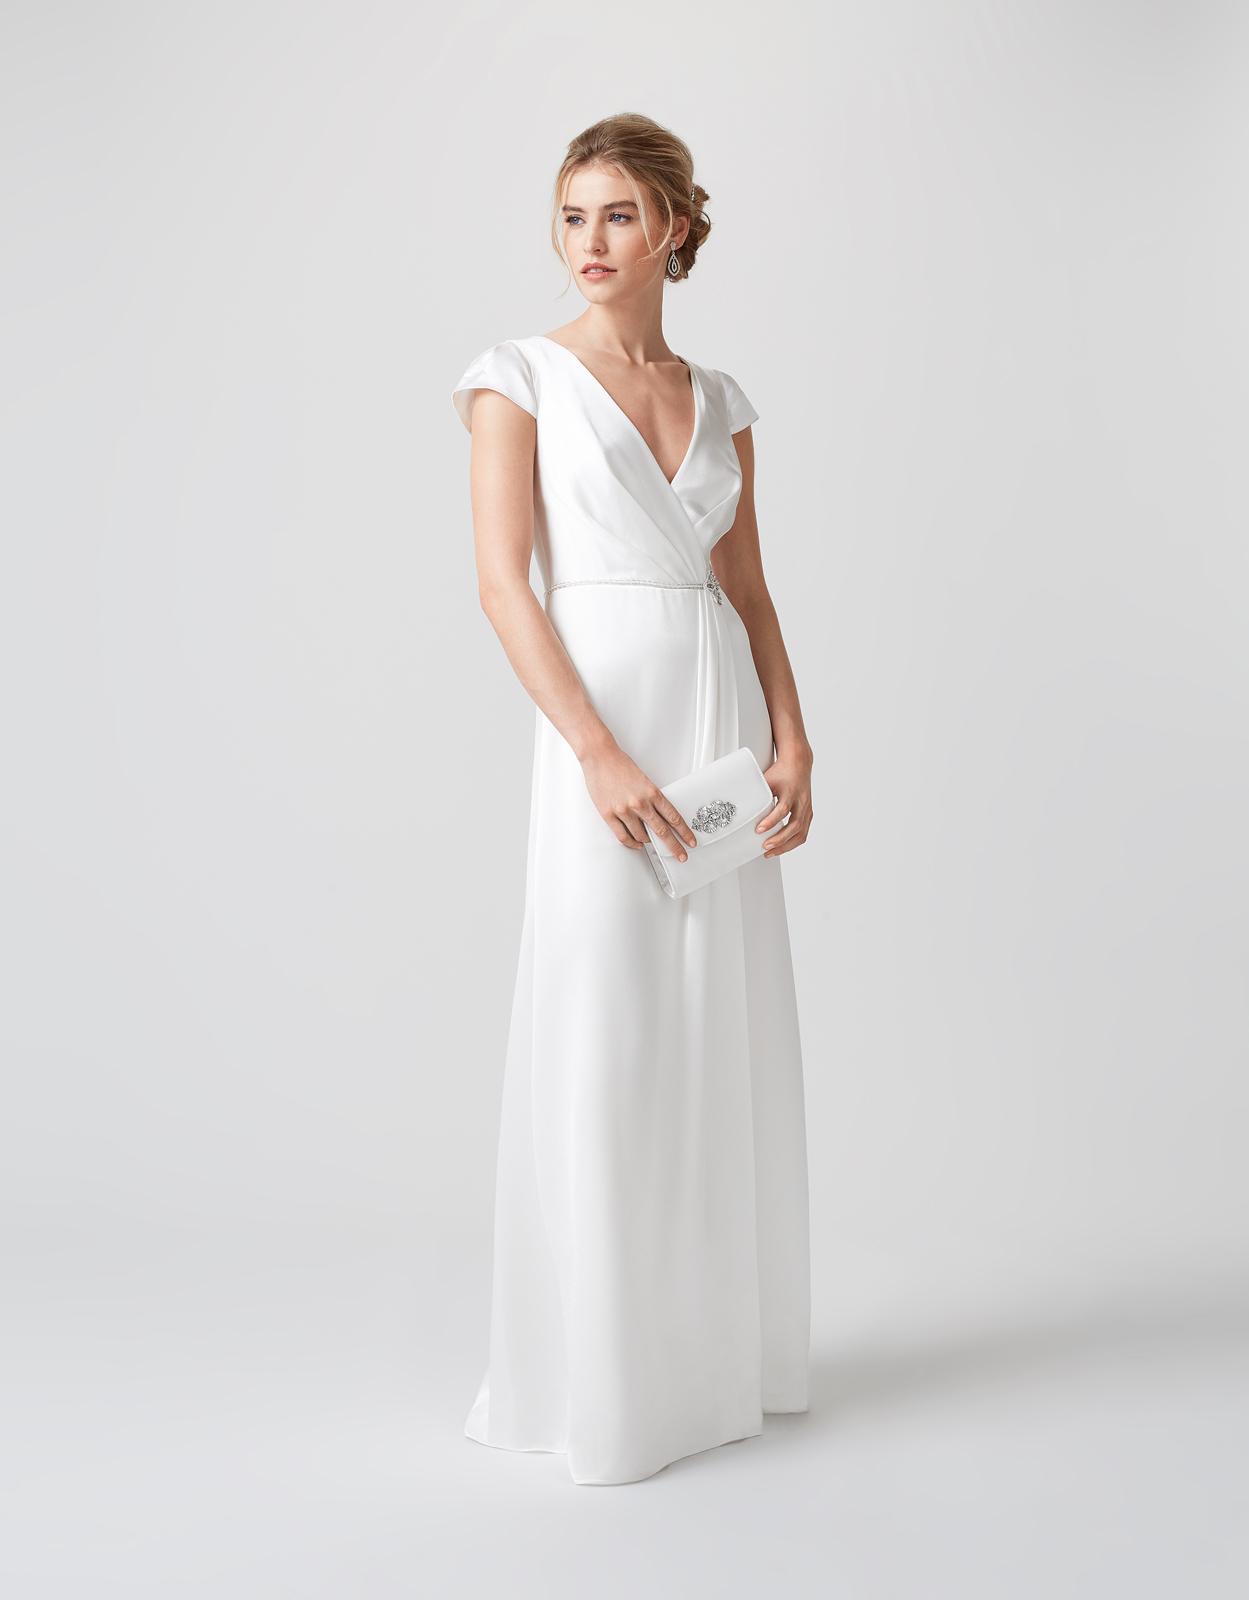 Vestidos Elegantes Para Bodas Baratos